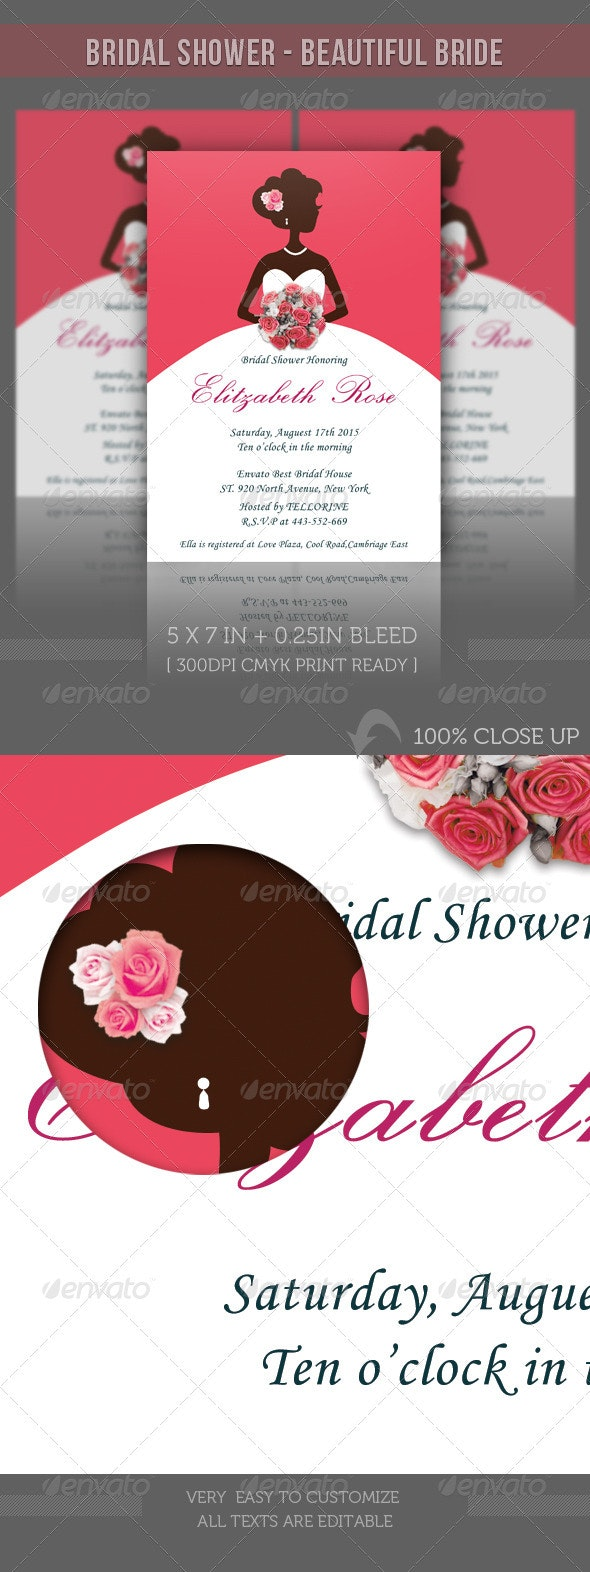 Bridal Shower Invitation - Beautiful Bride - Weddings Cards & Invites